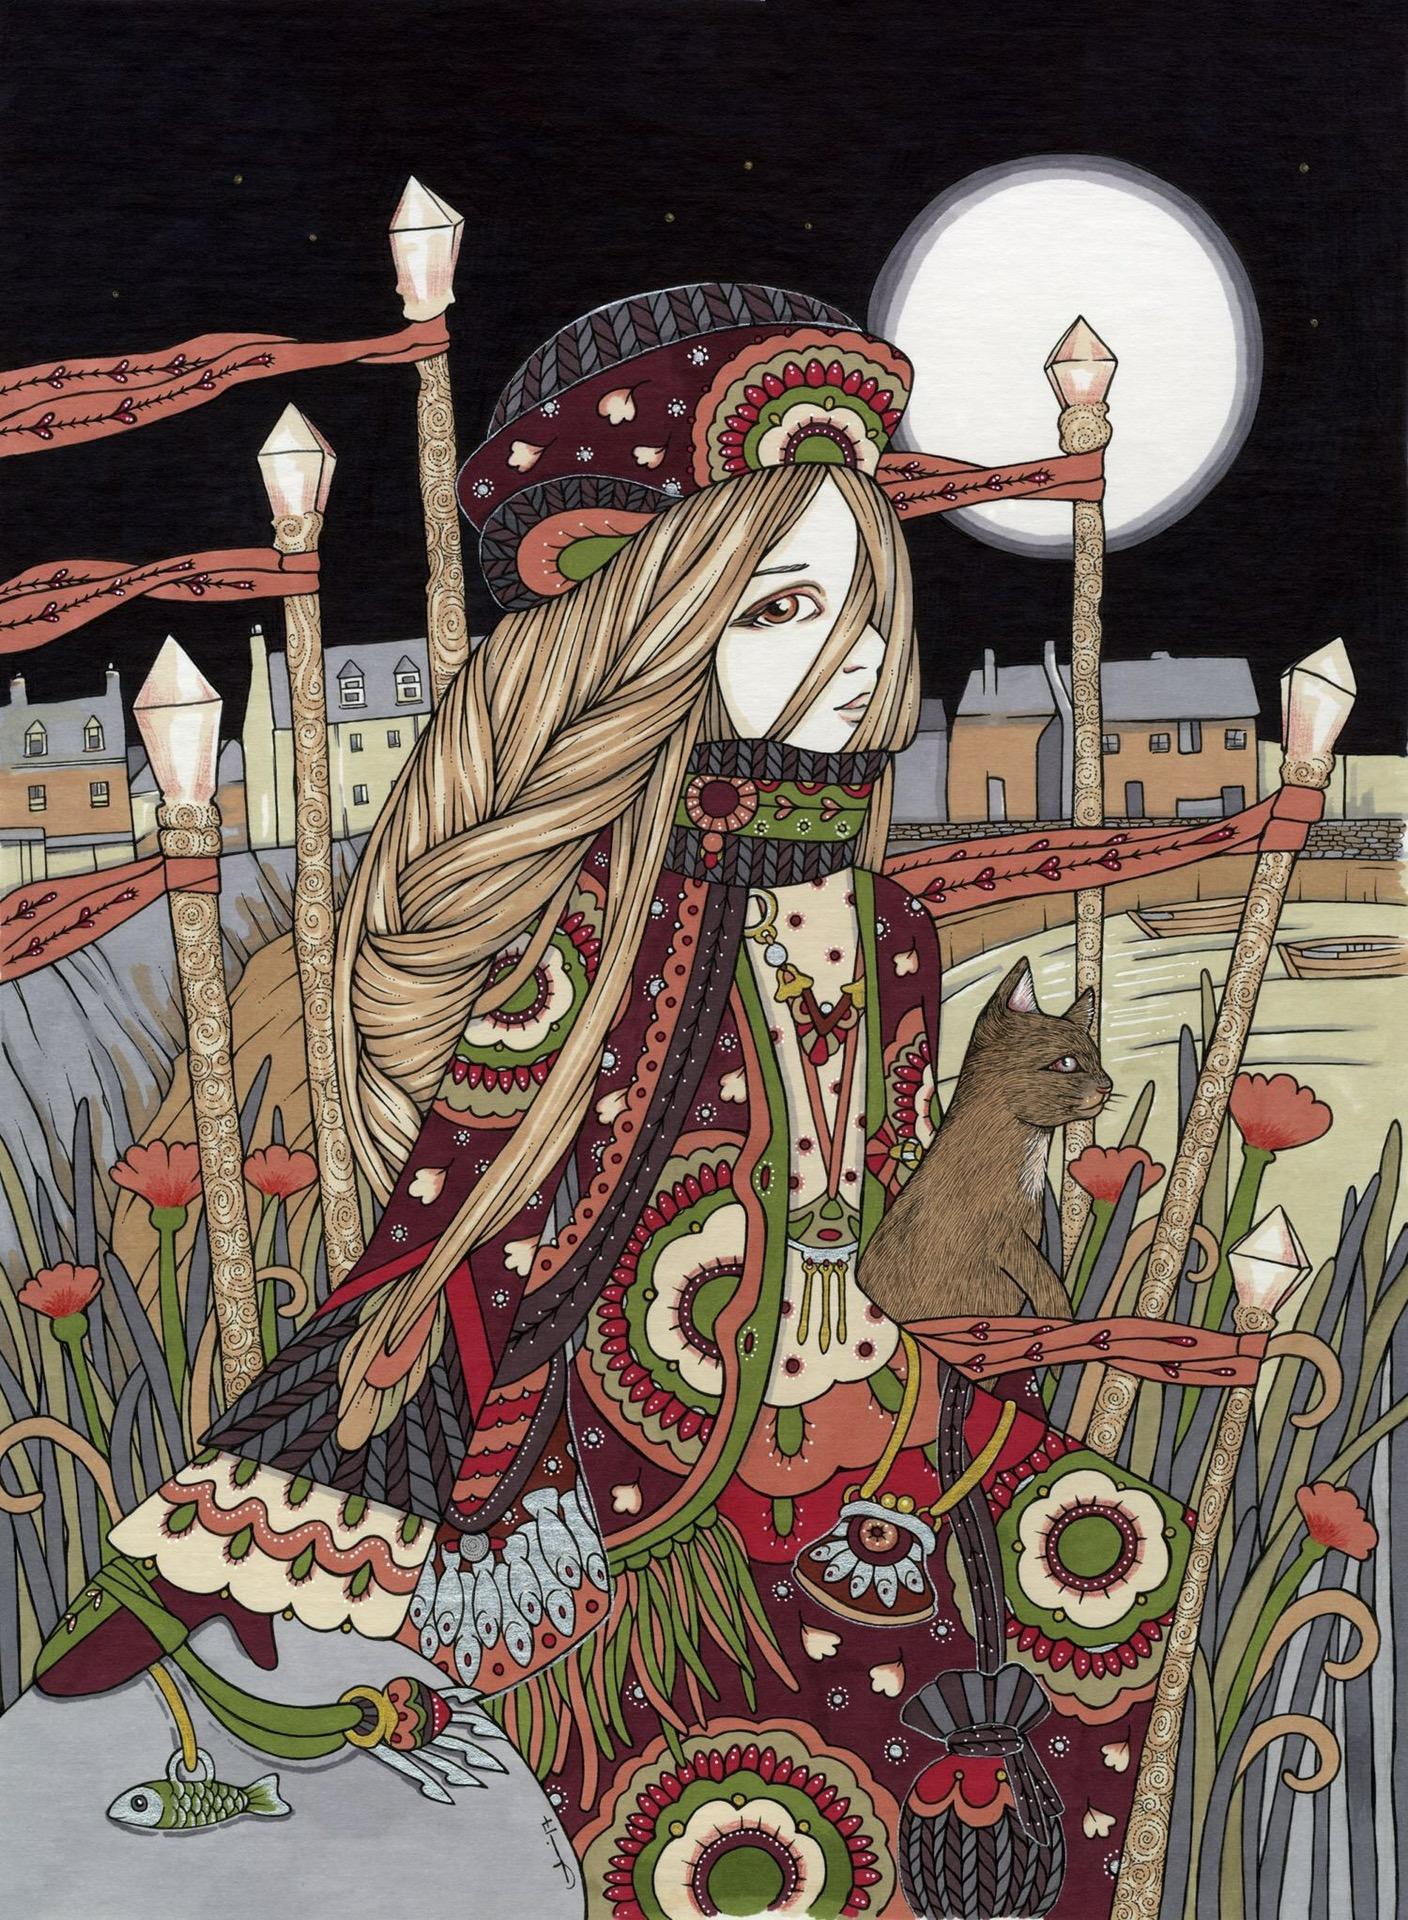 Weekly Tarot Reading I Healingtarotnet: Weekly Tarot Guidance For The Week Of June 12 Through 18